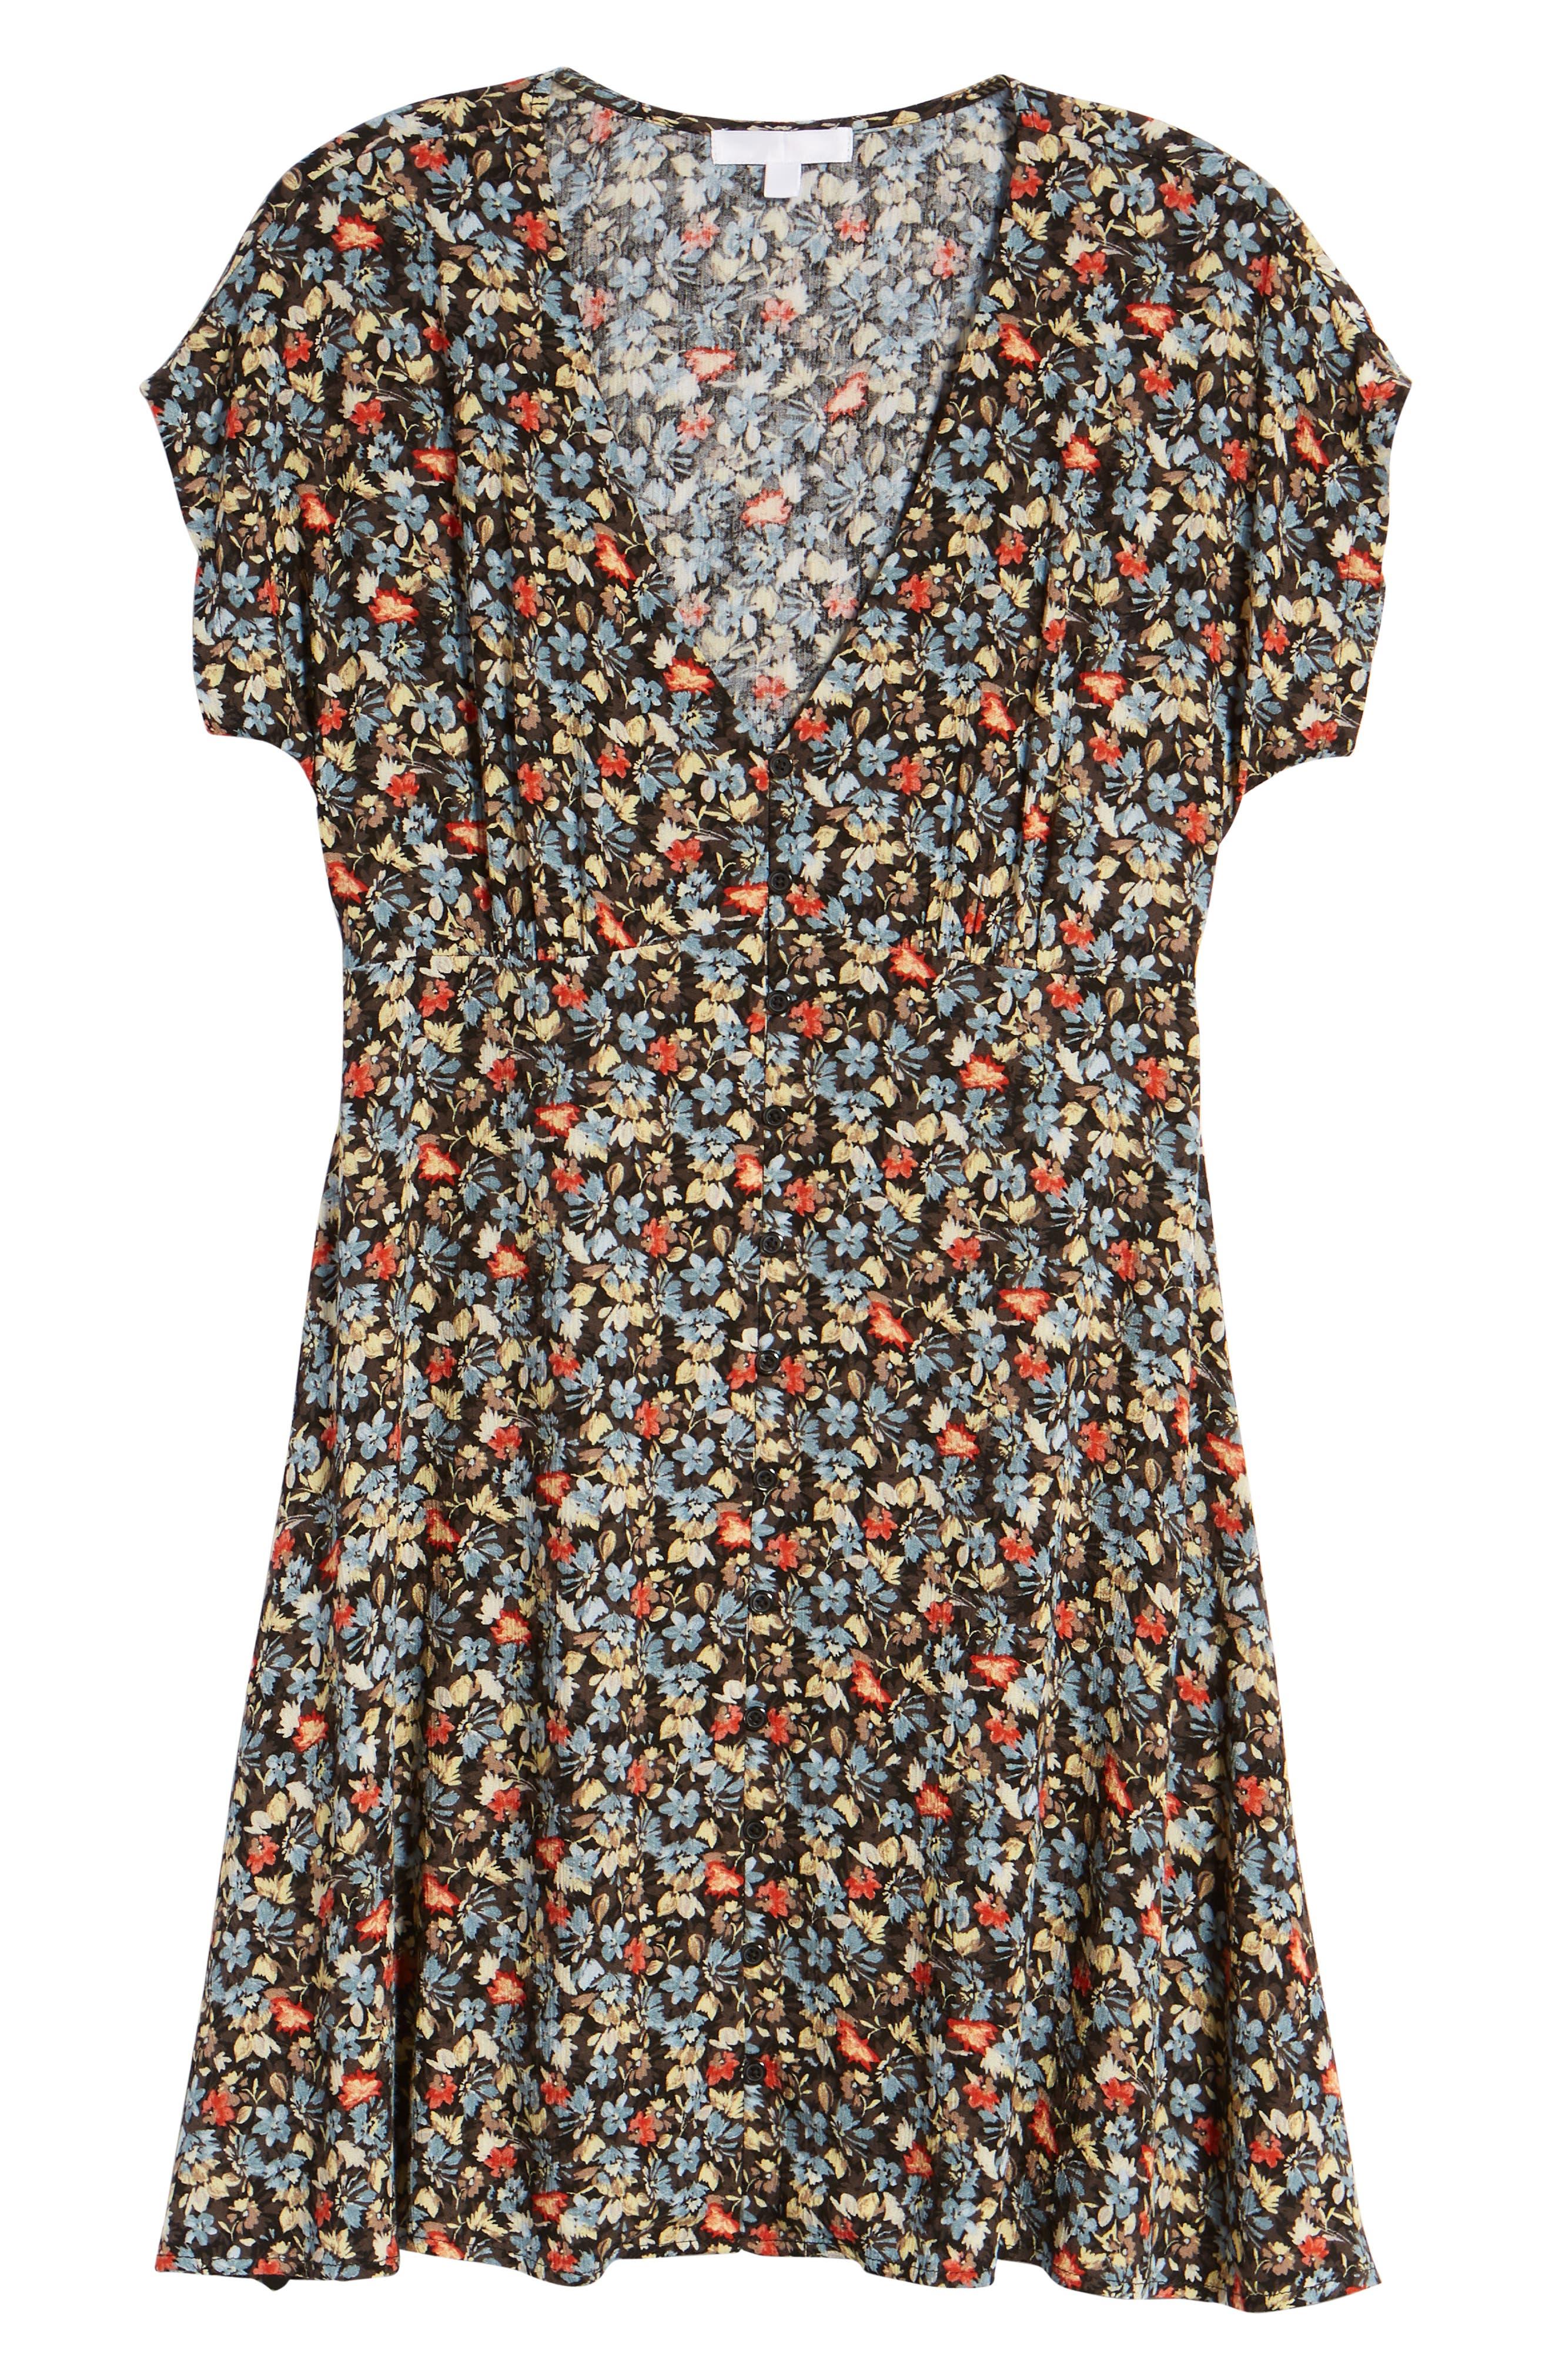 Floral Print Button Front Dress,                             Alternate thumbnail 7, color,                             BLACK GROUND FLORAL